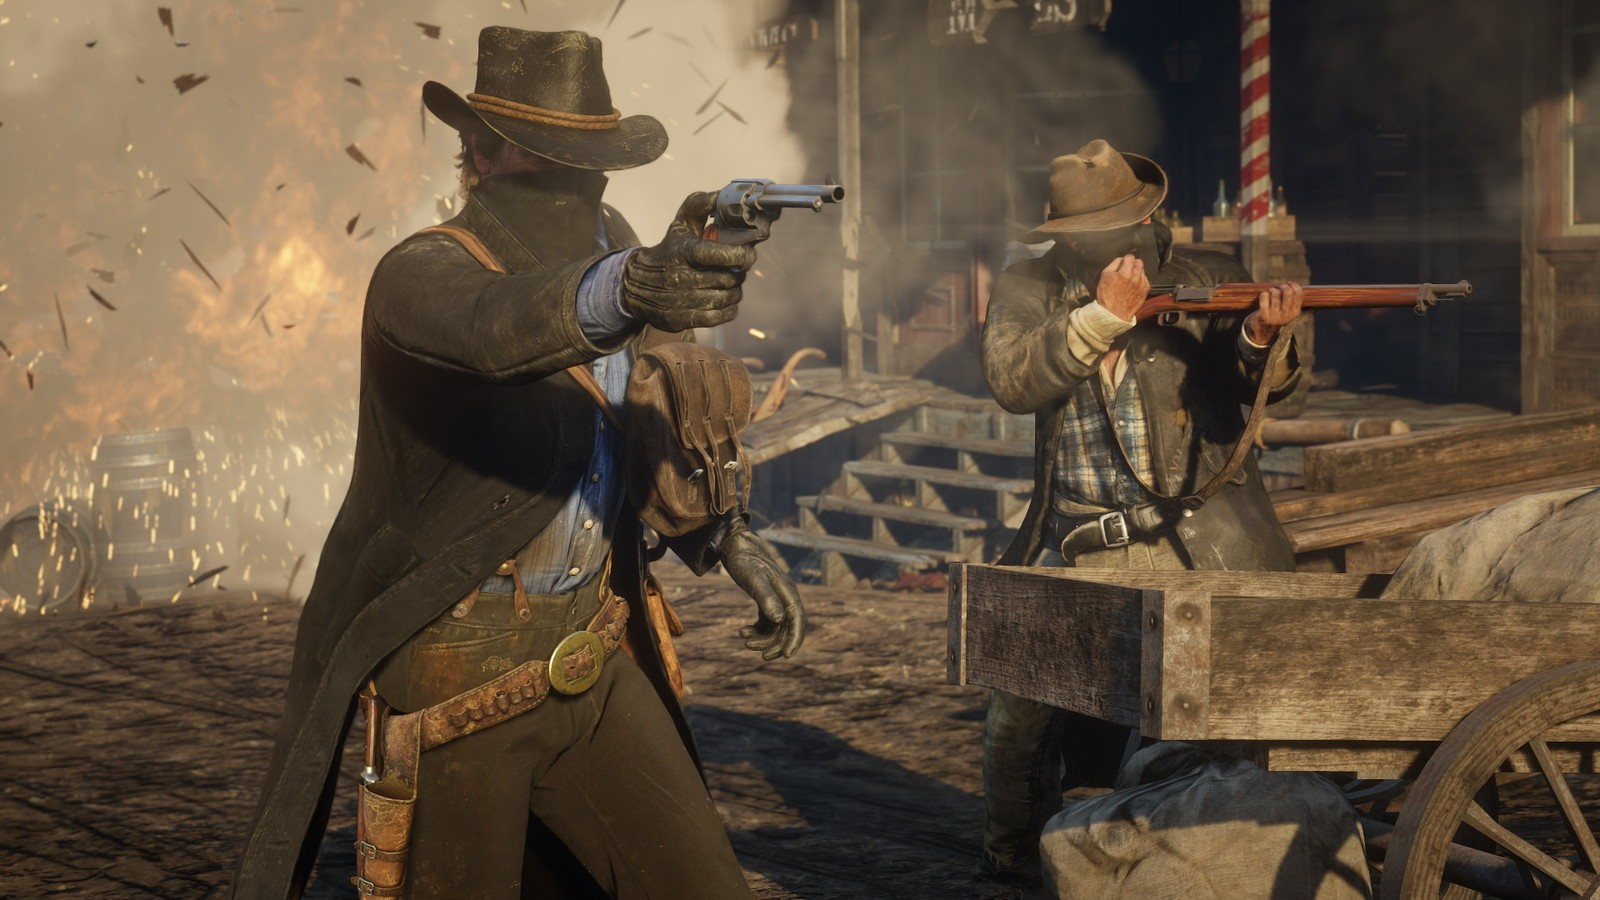 Next Red Dead Online update detailed